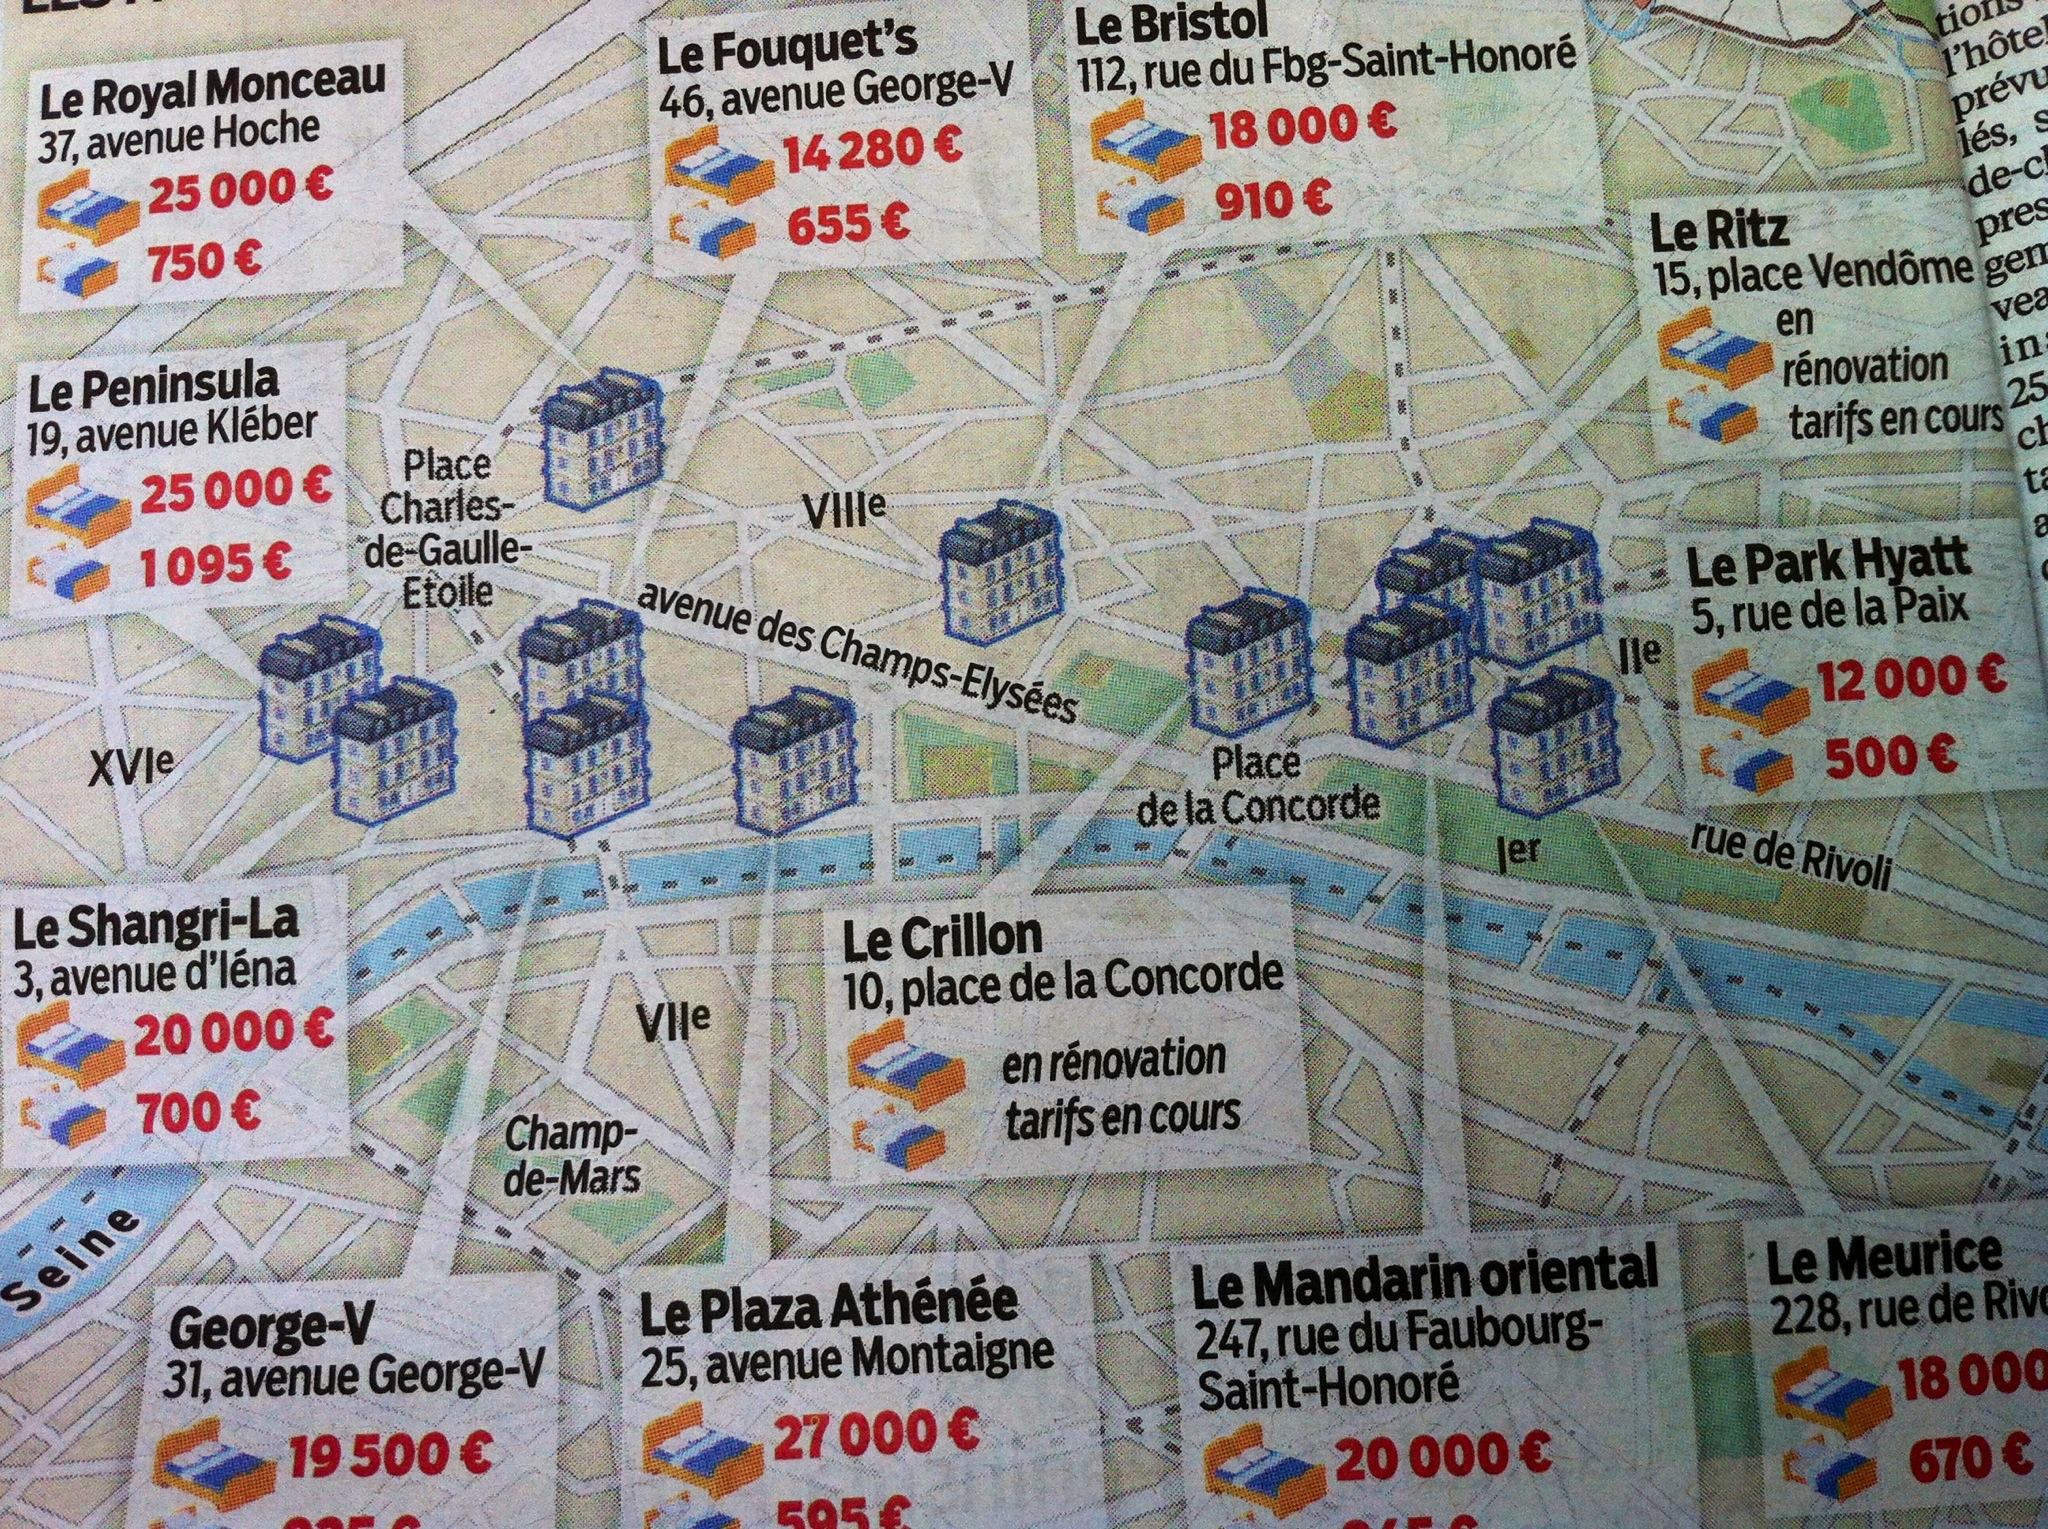 PENINSULA PLAN HOTELS PARIS LUXE